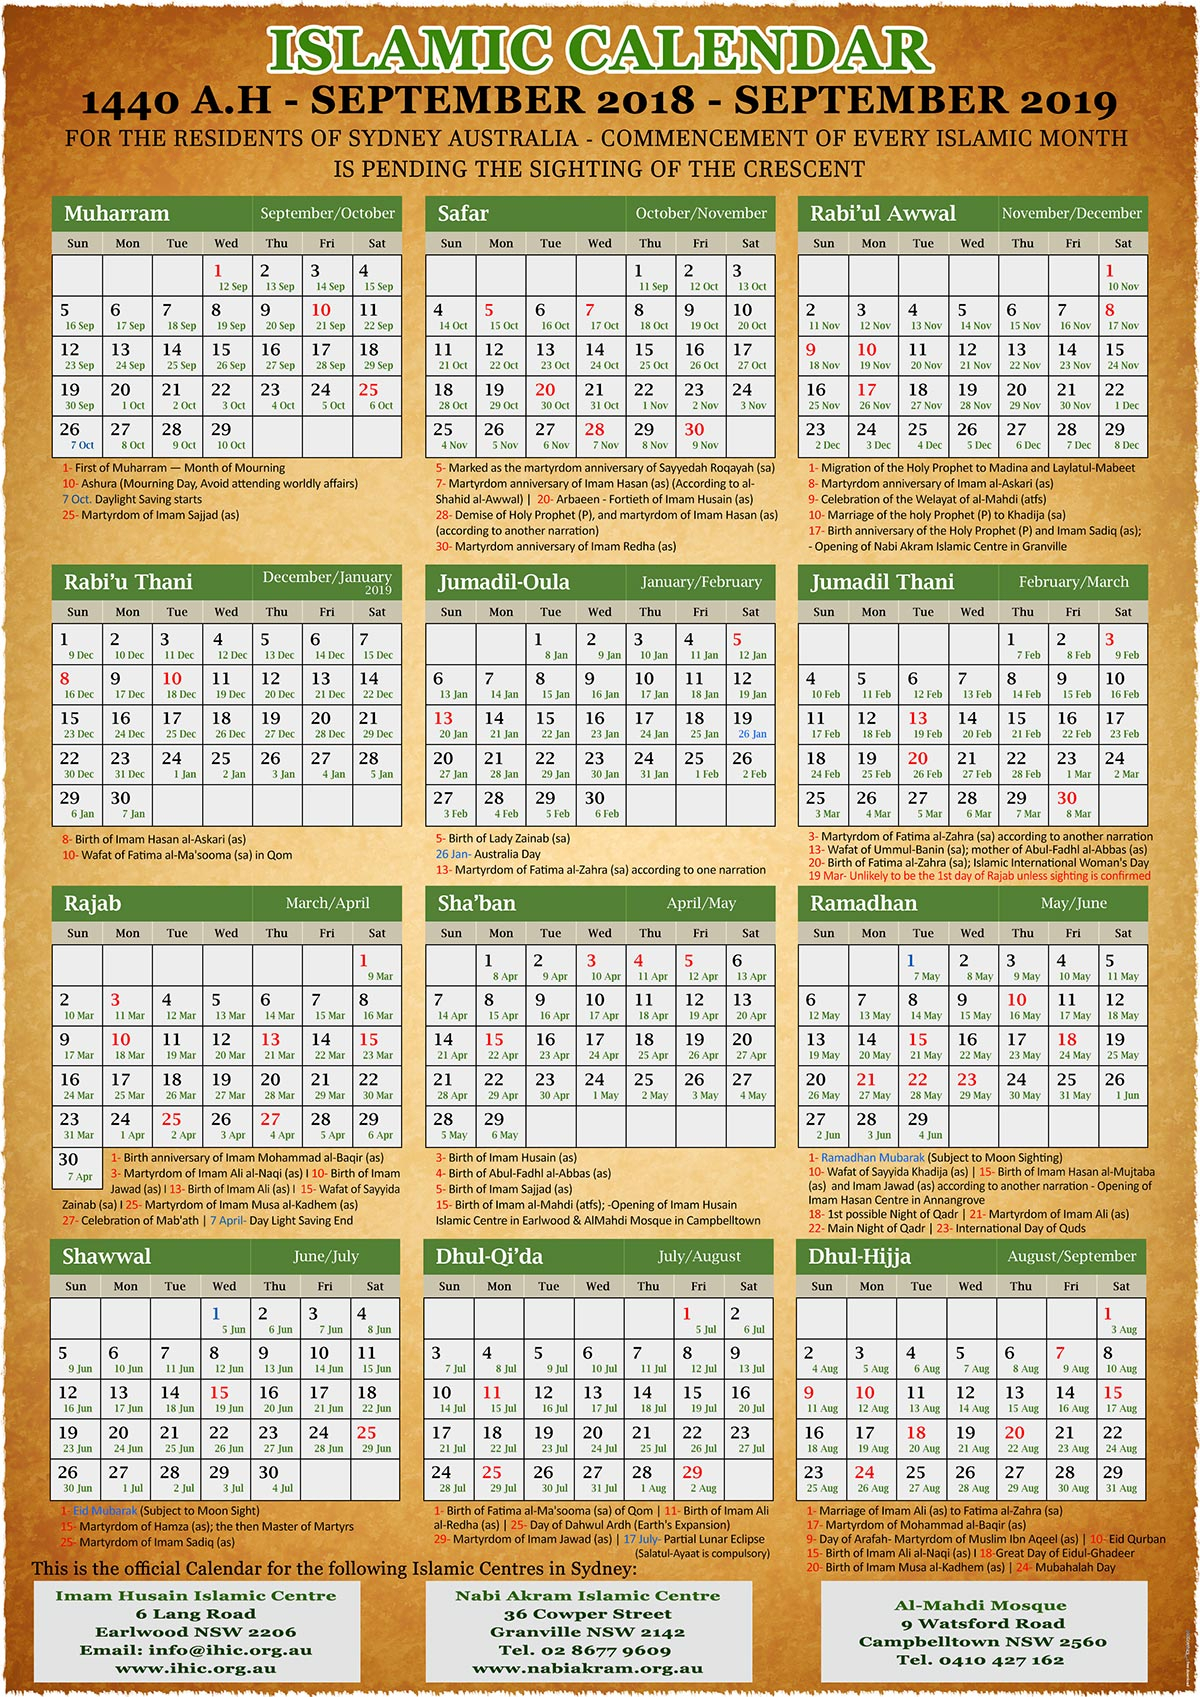 Annual Islamic Calendar 1440 A.h. (2019) – Imam Husain intended for 1440 Hijri Calendar